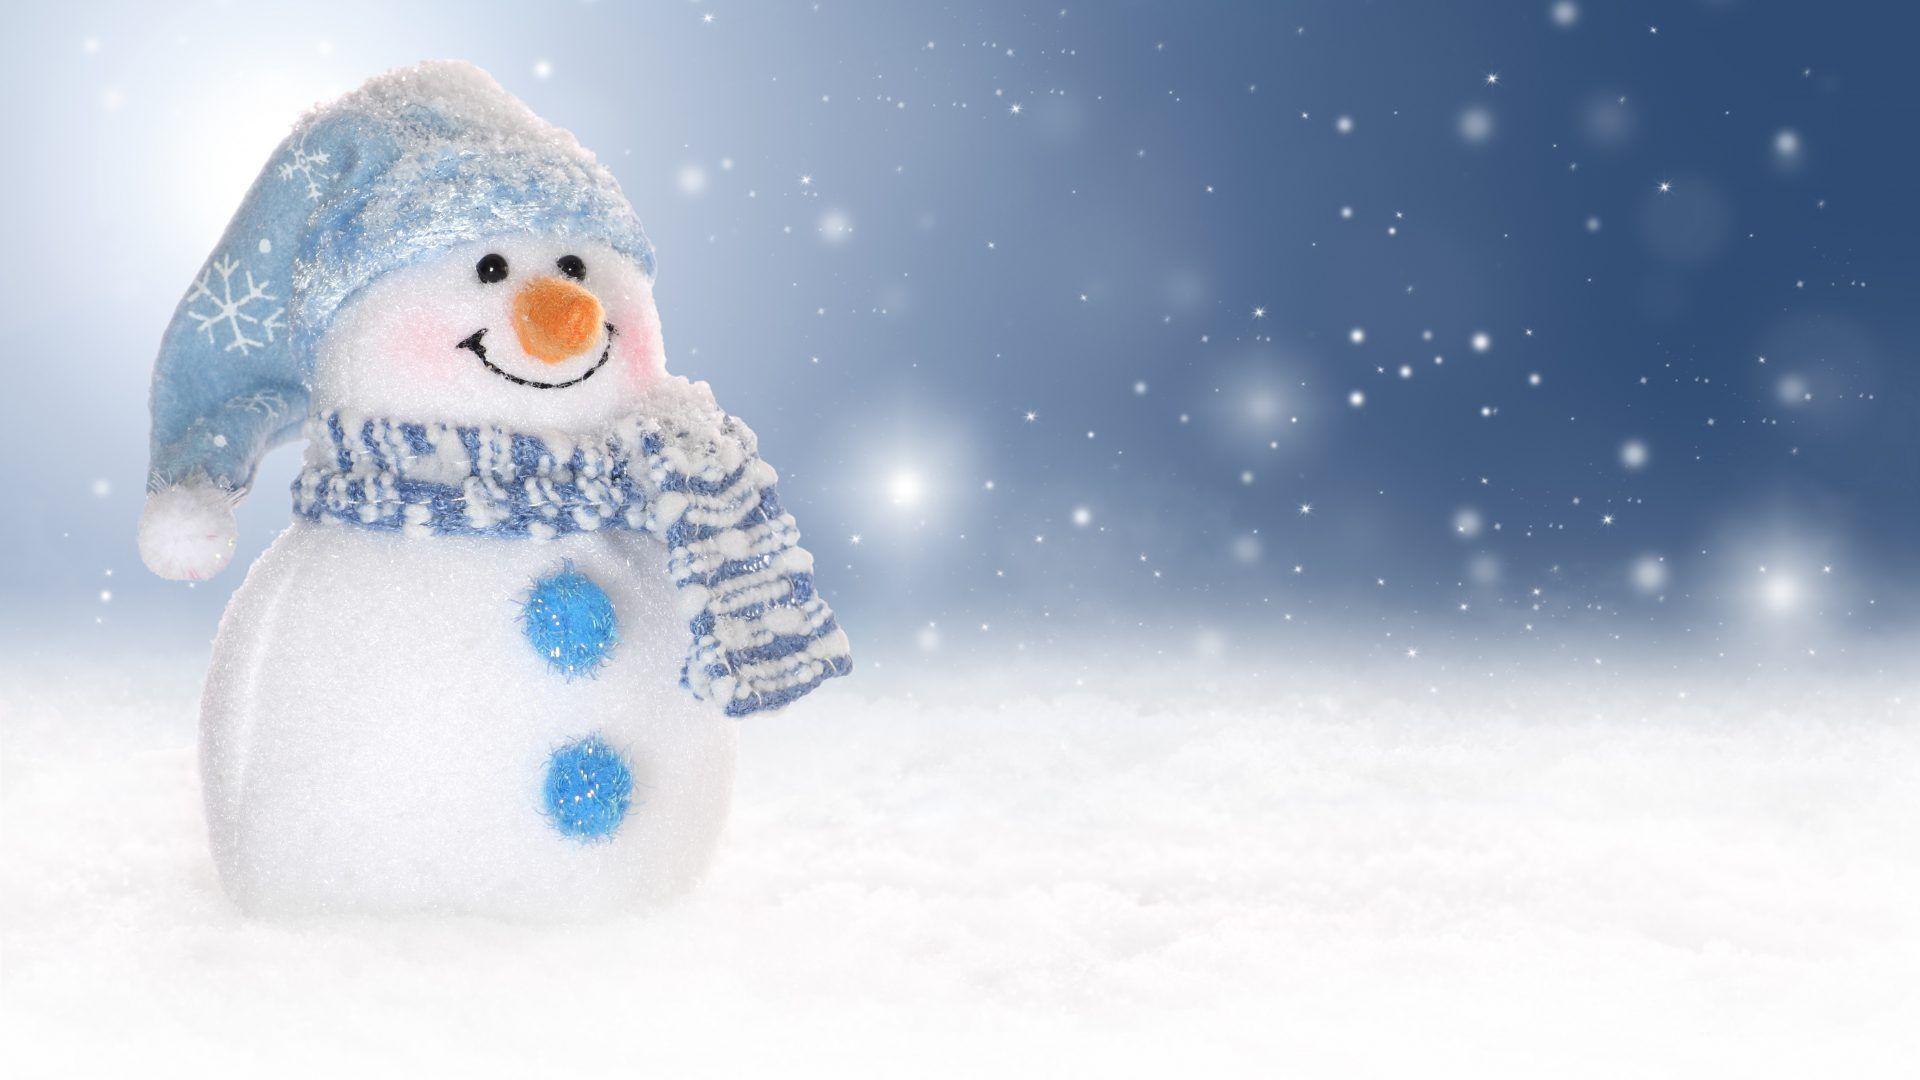 Winter Snowman Snow Xmas Cute Christmas Characters Desktop Backgrounds For Free 1920x1080 Jpg 1920 1080 Snowman Wallpaper Winter Background Winter Wallpaper